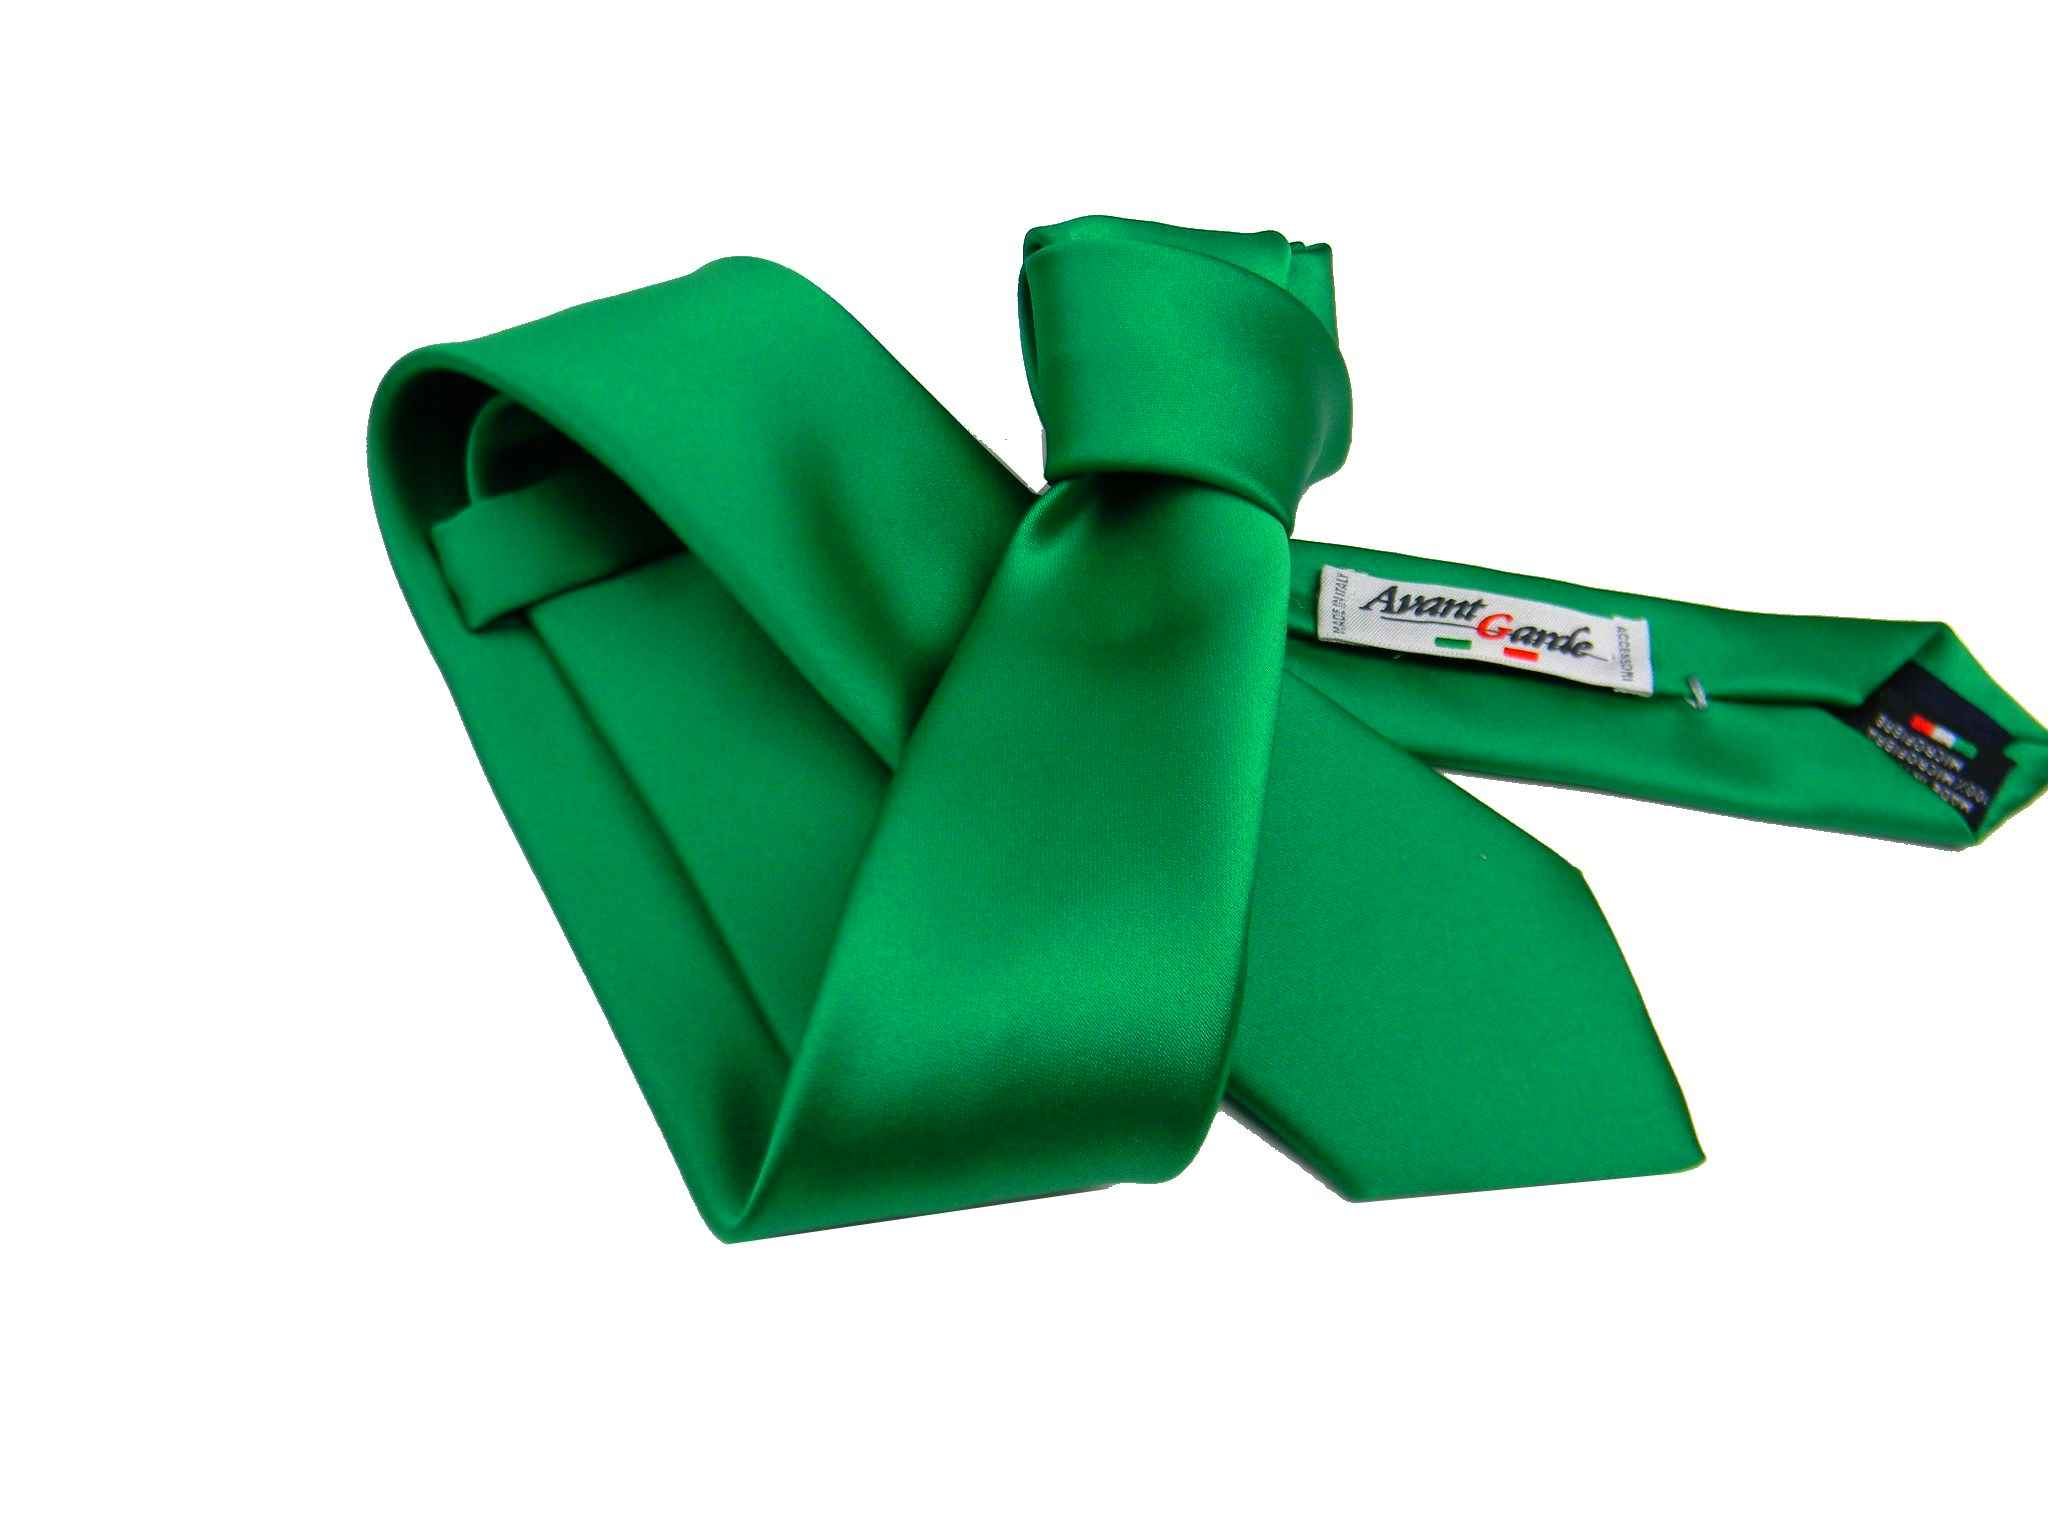 Cravatta da bambino elegante cravatte bimbo tinta unita tutti i colori 0 15 anni